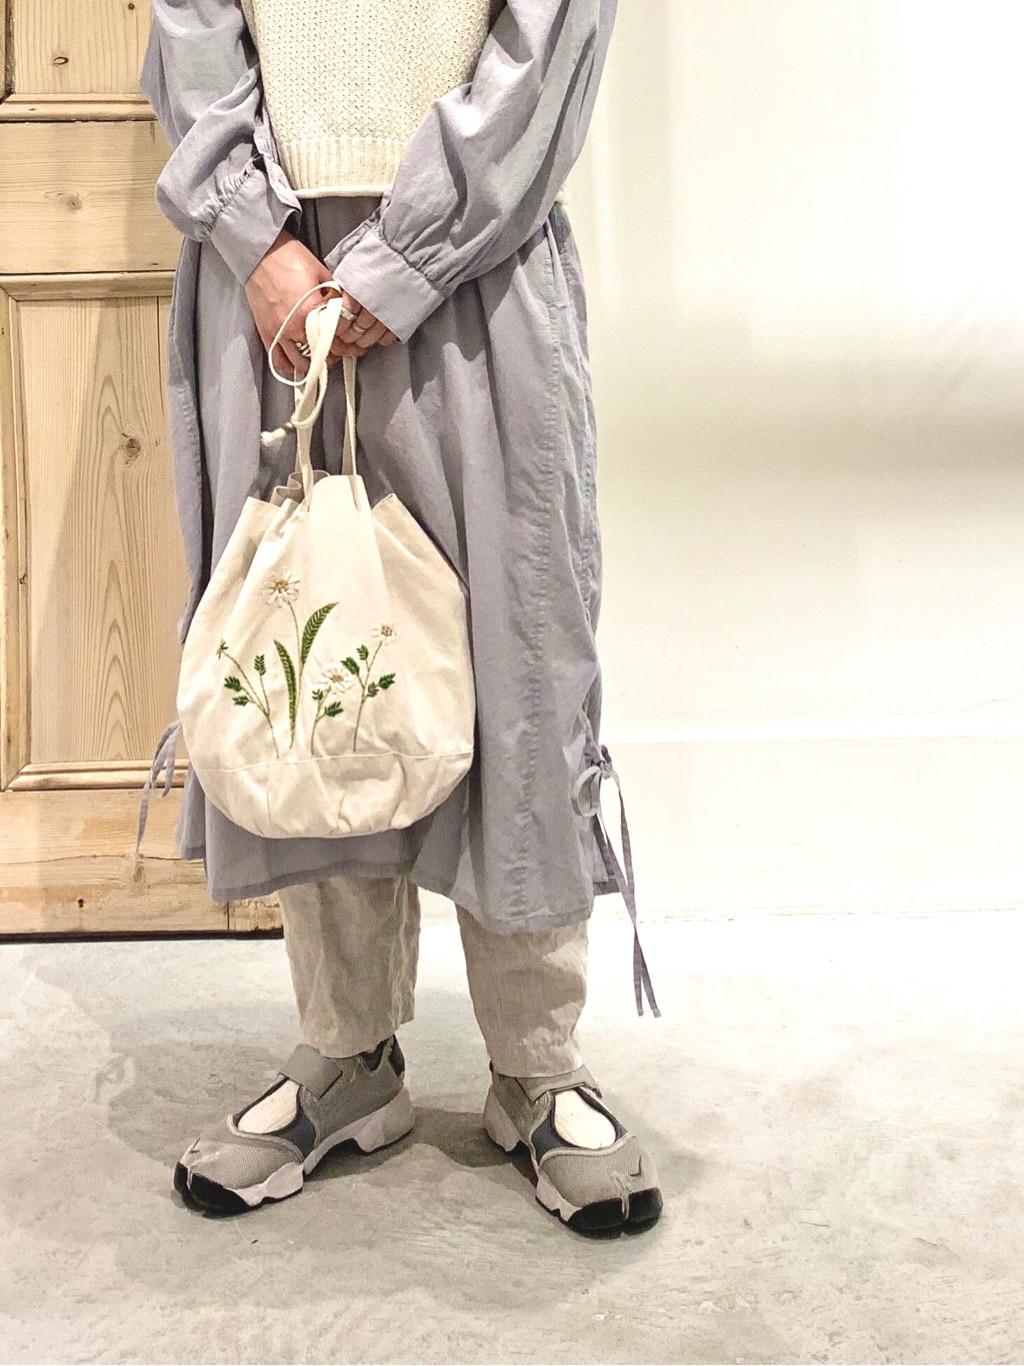 Malle chambre de charme 調布パルコ 身長:152cm 2021.02.09